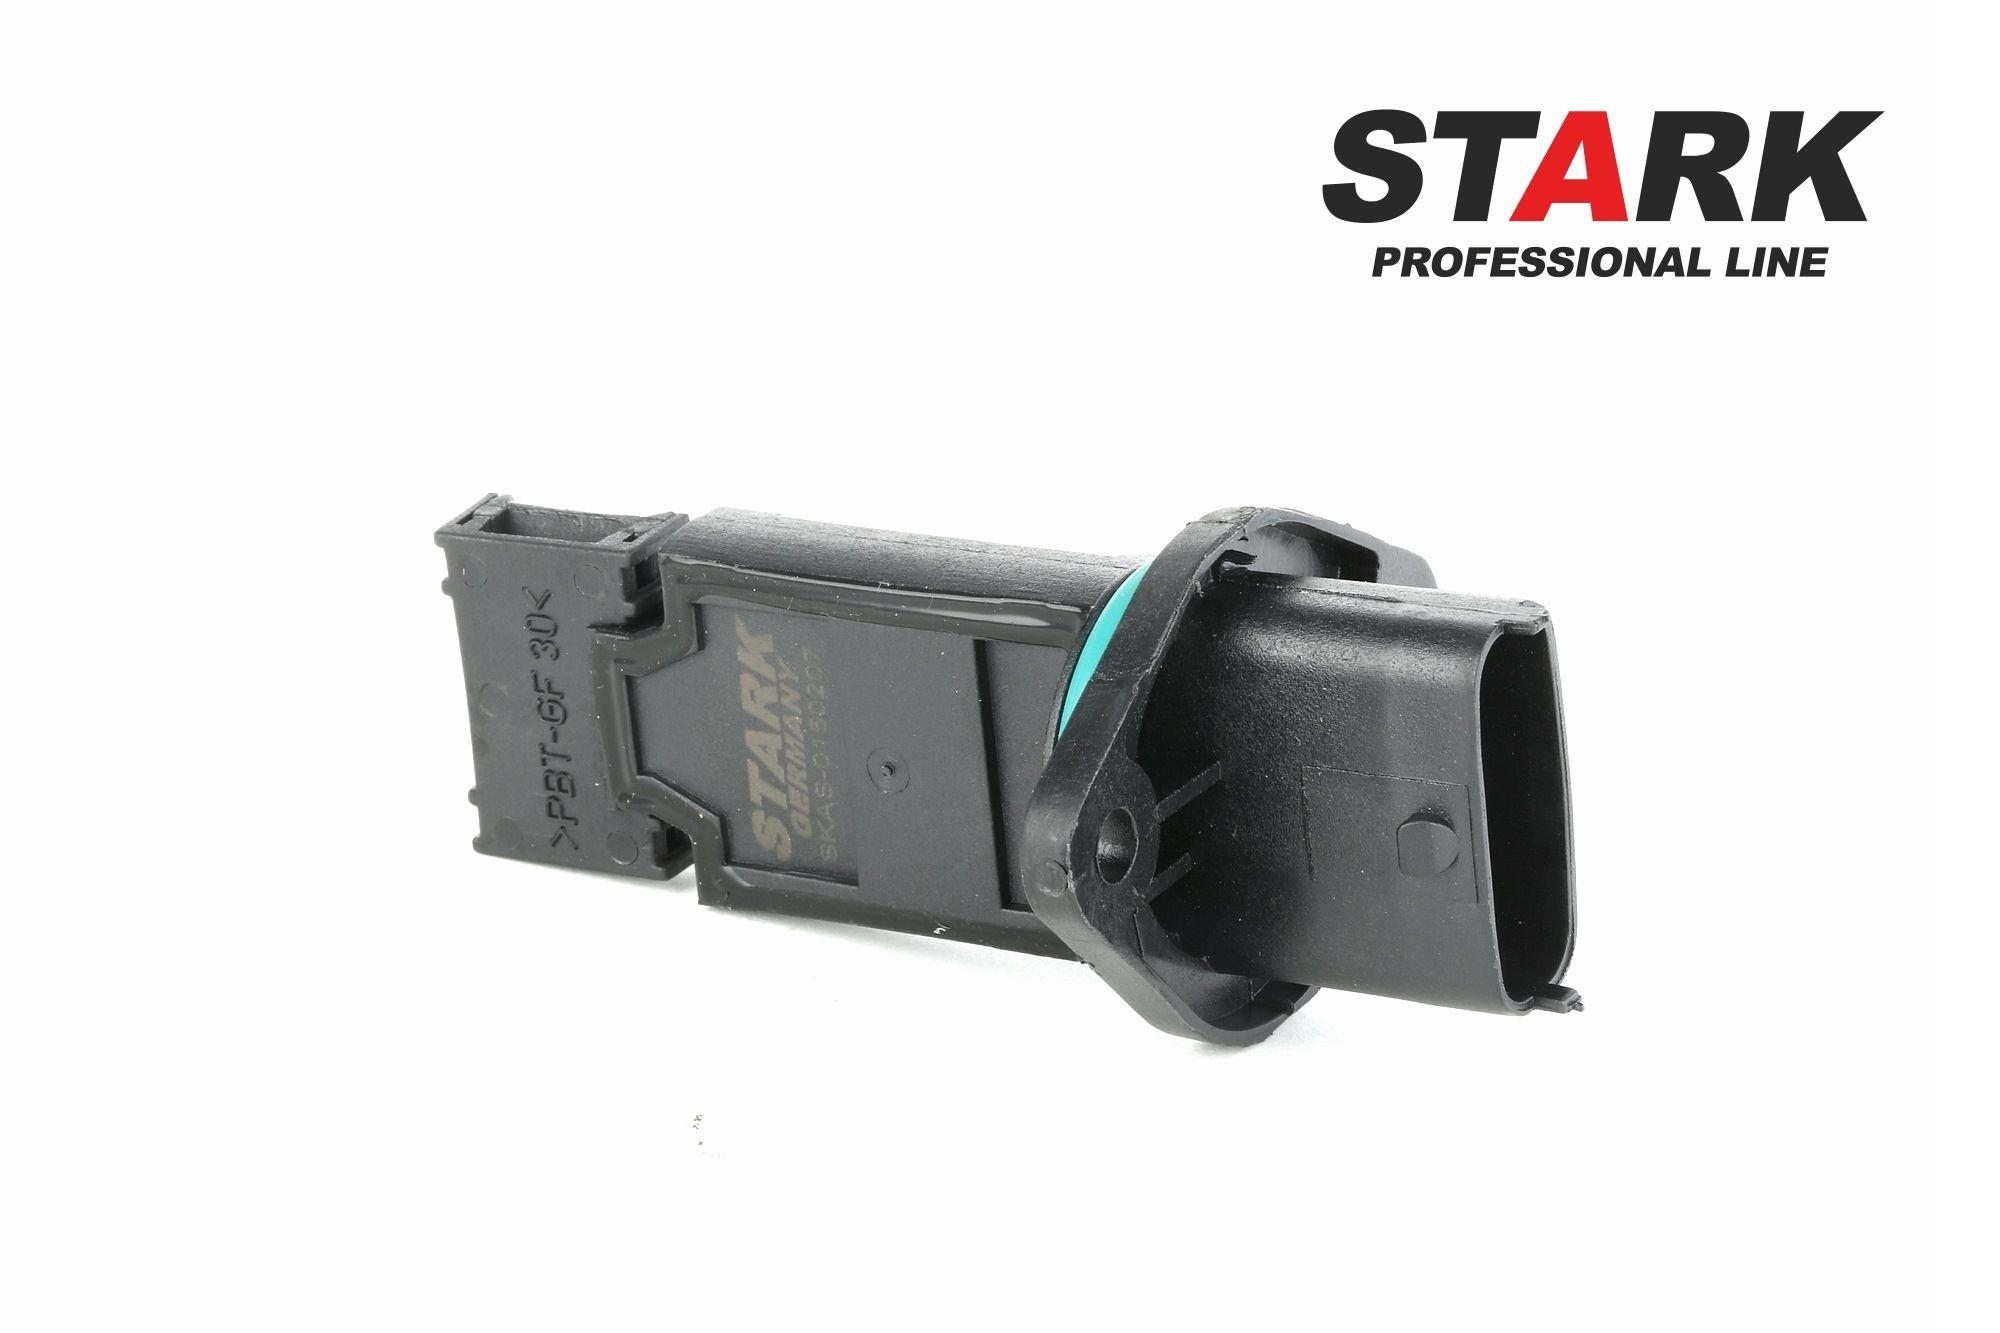 STARK: Original Luftmassensensor SKAS-0150207 (Spannung: 12V, Pol-Anzahl: 5-polig)